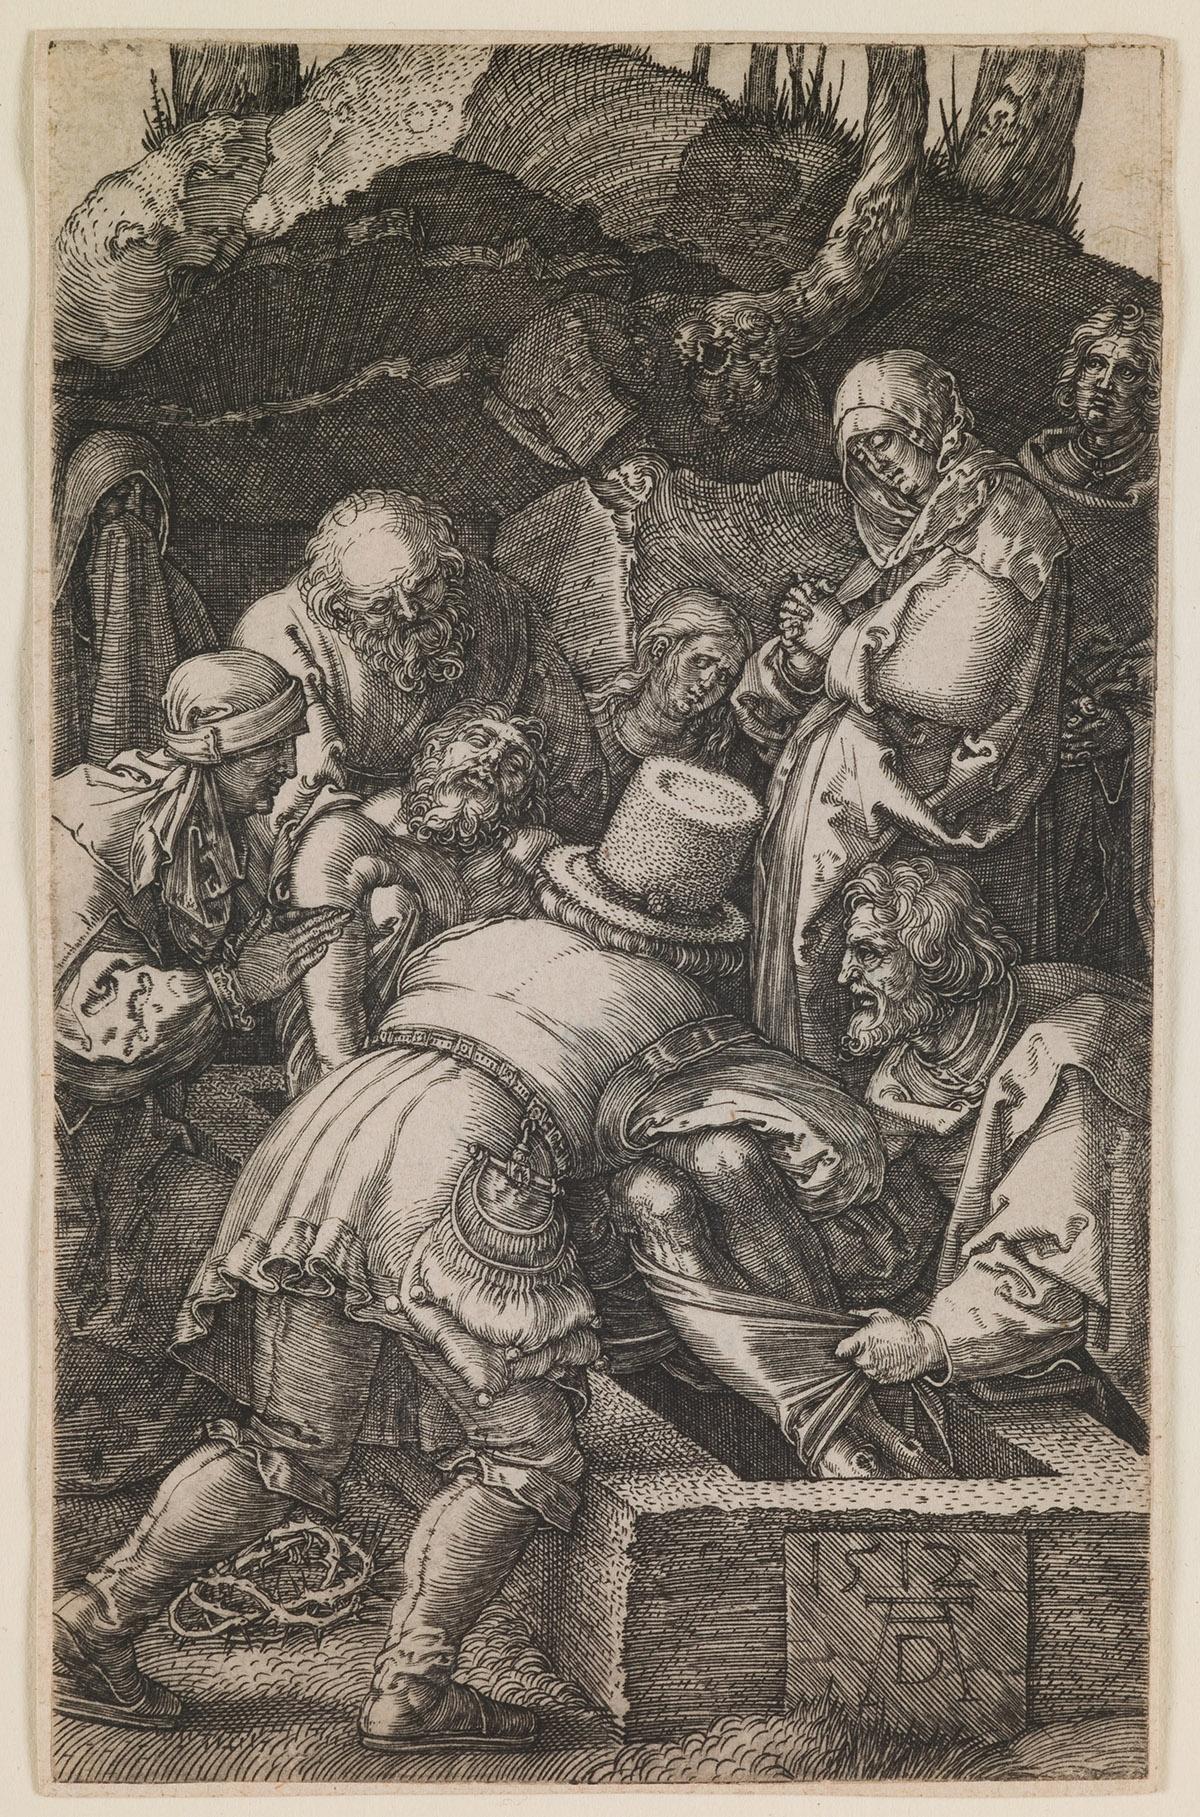 "Image Credit: Deposition, from the series ""The Little Passion"", 1512 (engraving), Dürer or Duerer, Albrecht (1471-1528) / Saint Louis Art Museum, Missouri, USA / Museum purchase / Bridgeman Images"